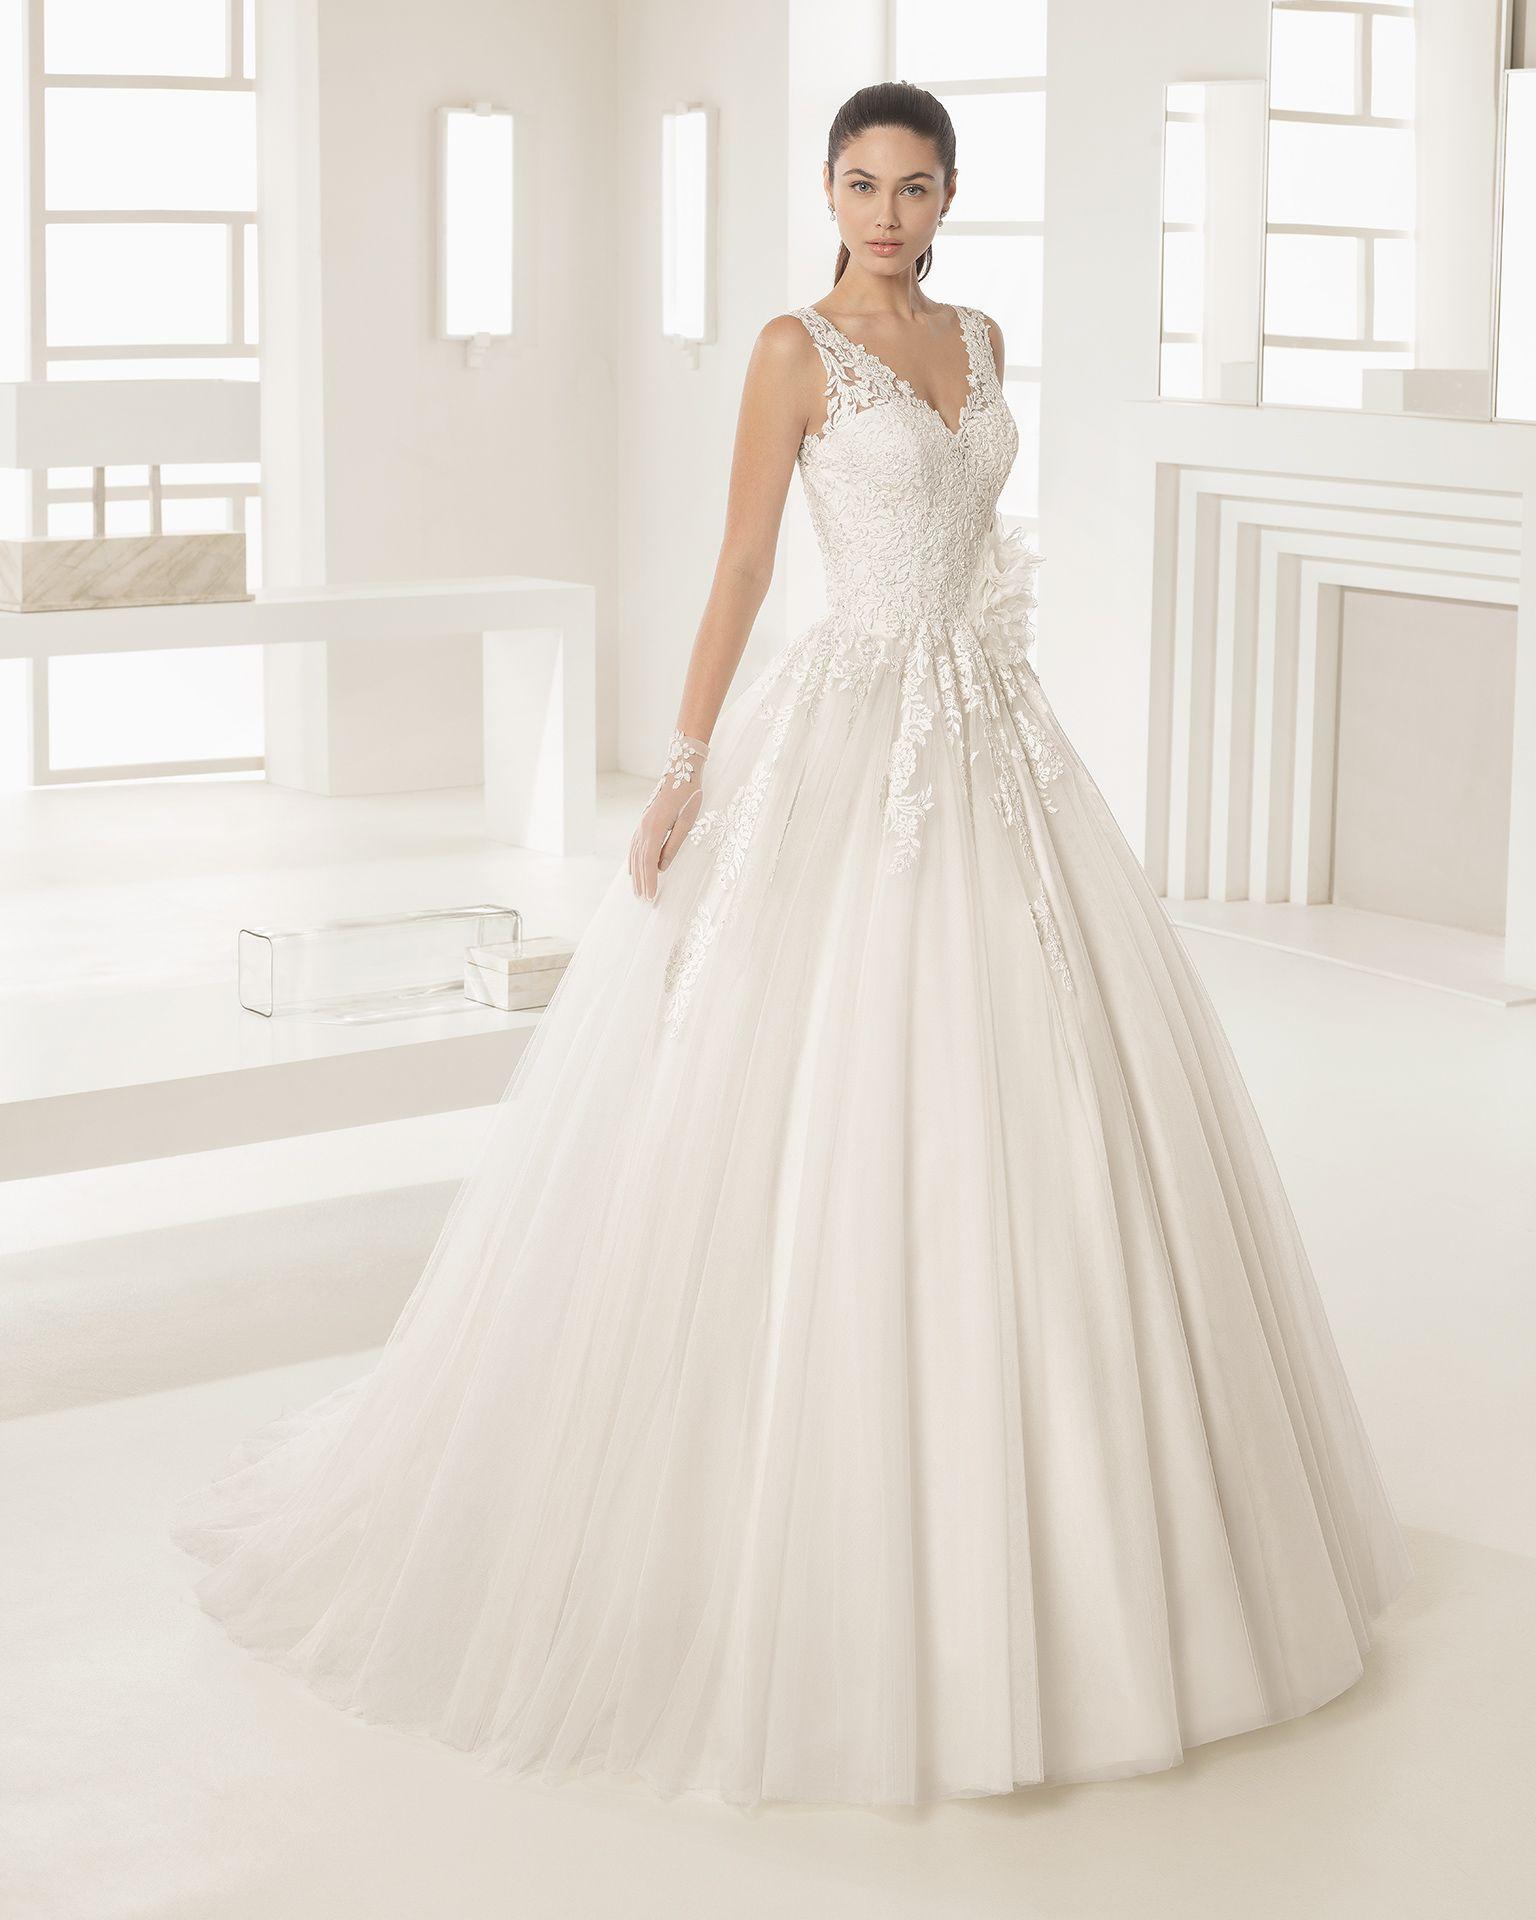 Vestidos para bodas en octubre 2019